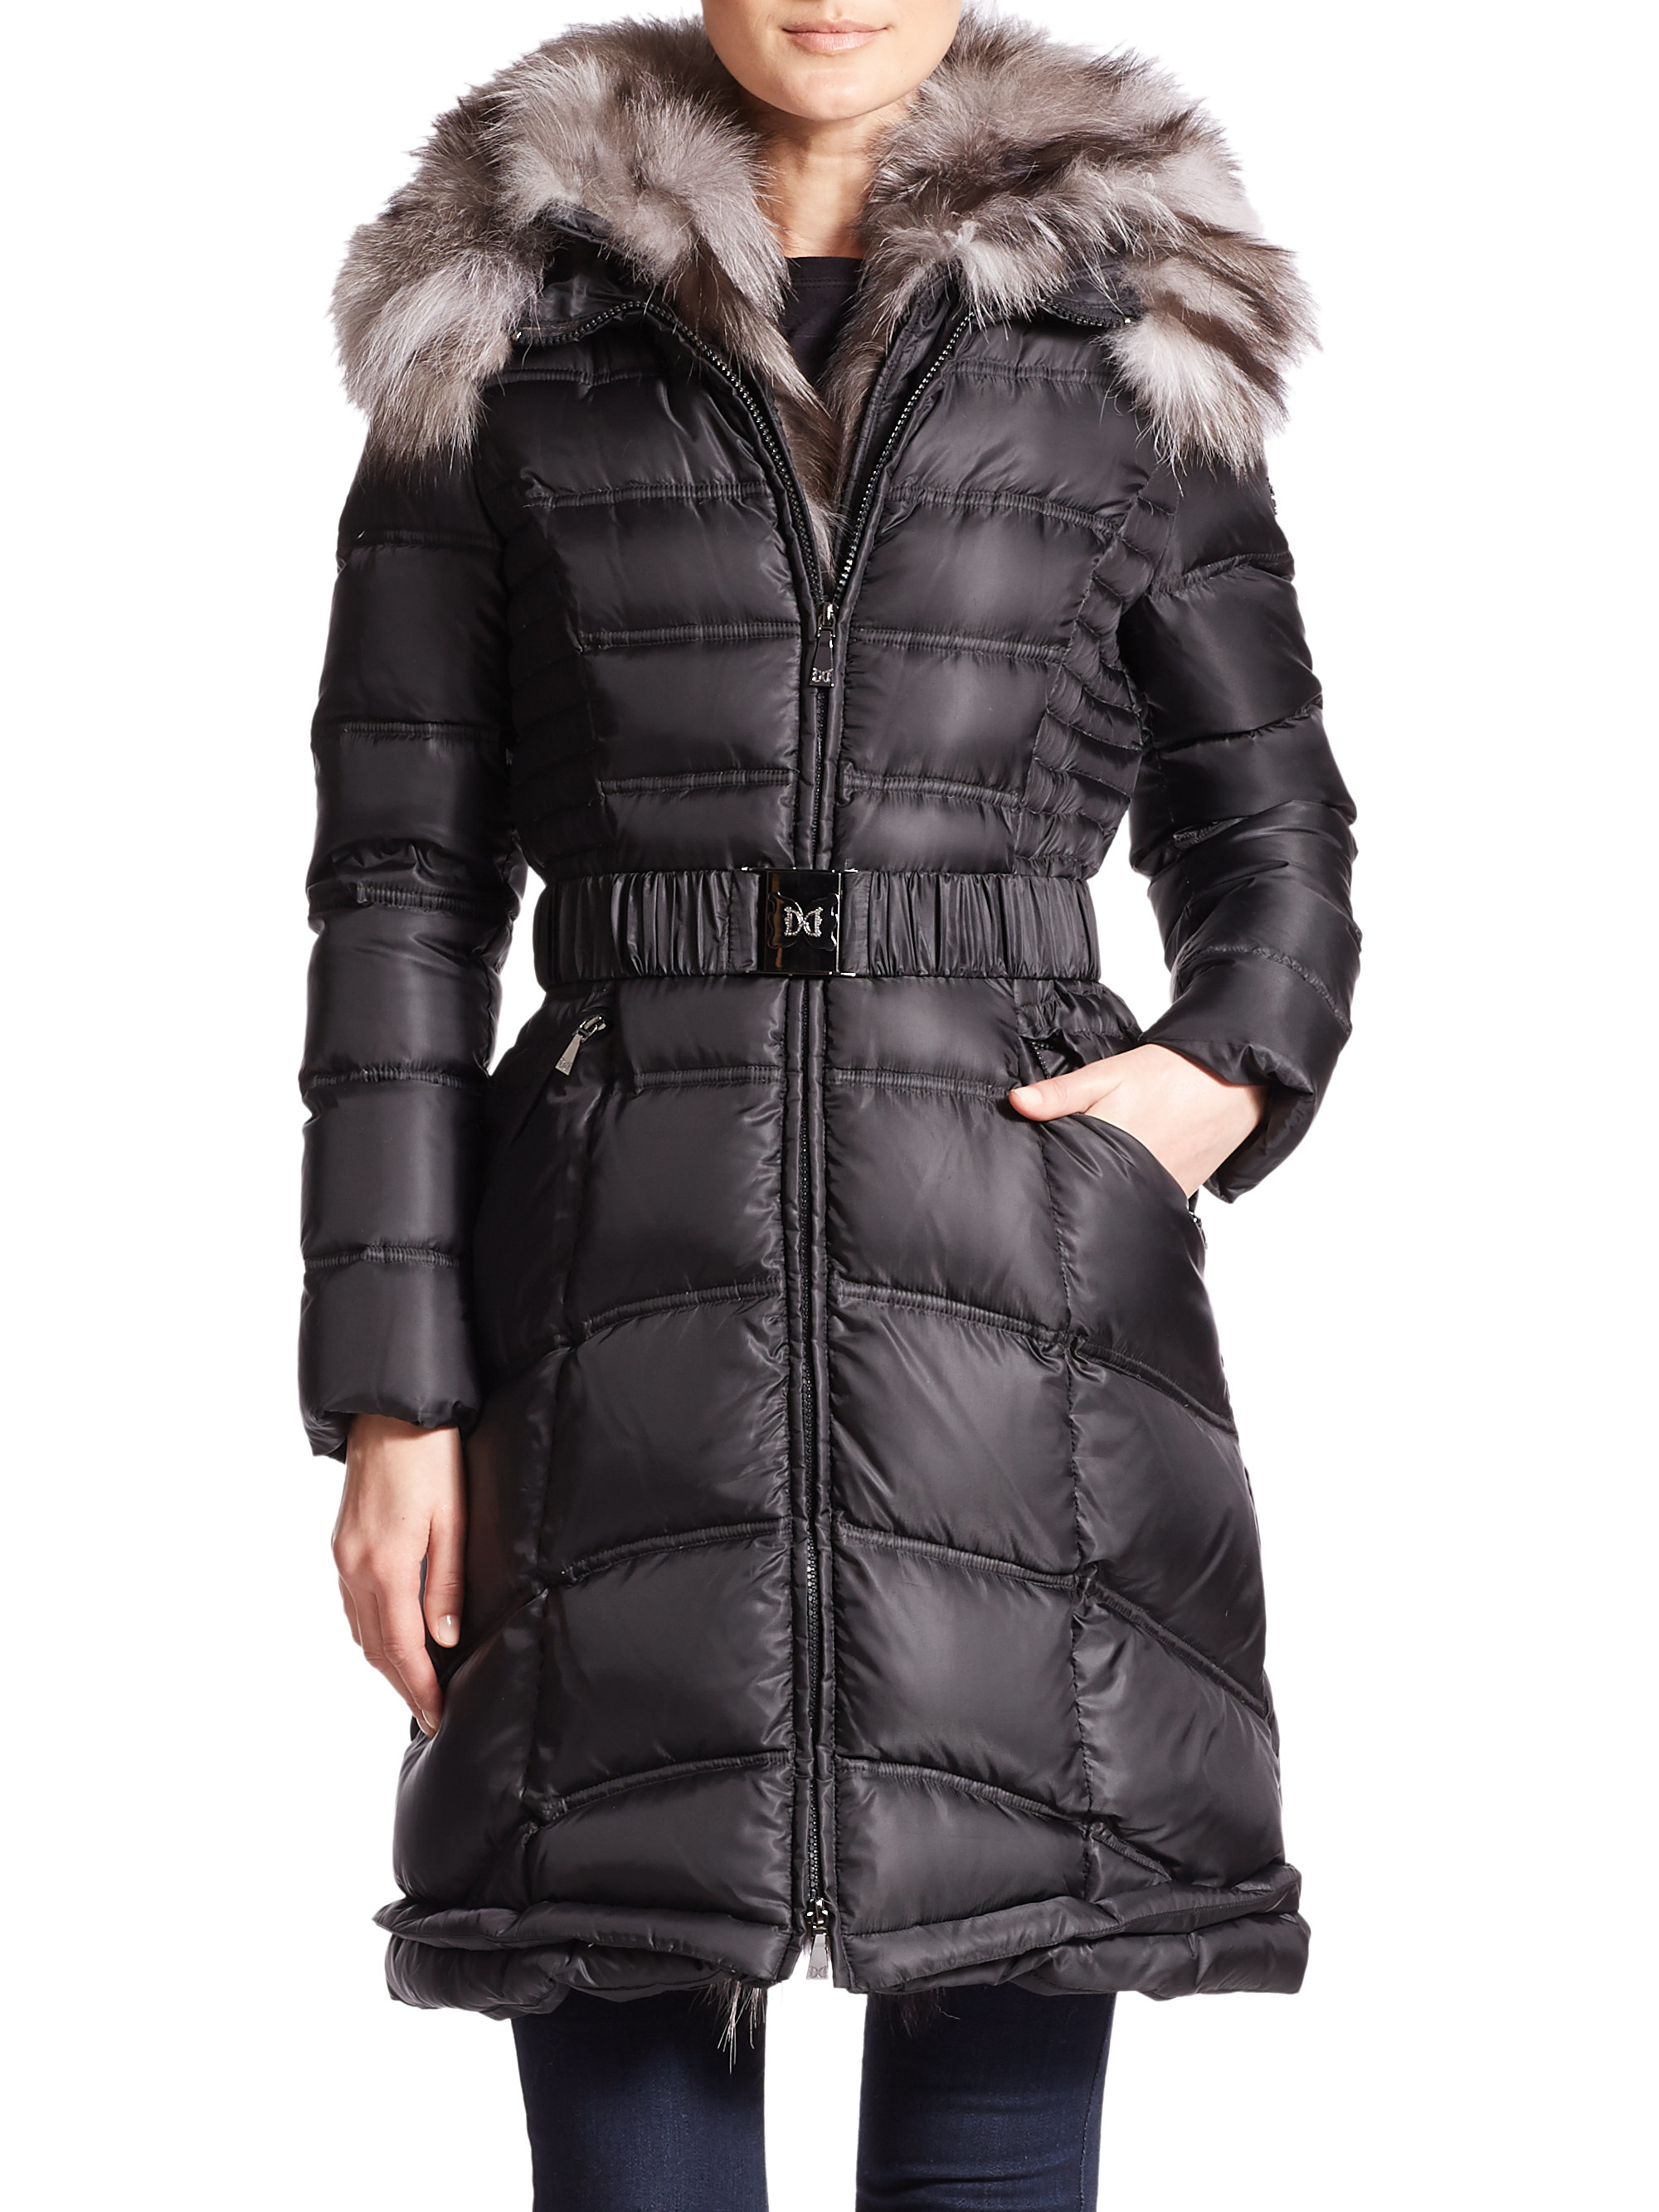 Dawn Levy Cat Ii Fur Trimmed Long Puffer Coat In Black Lyst